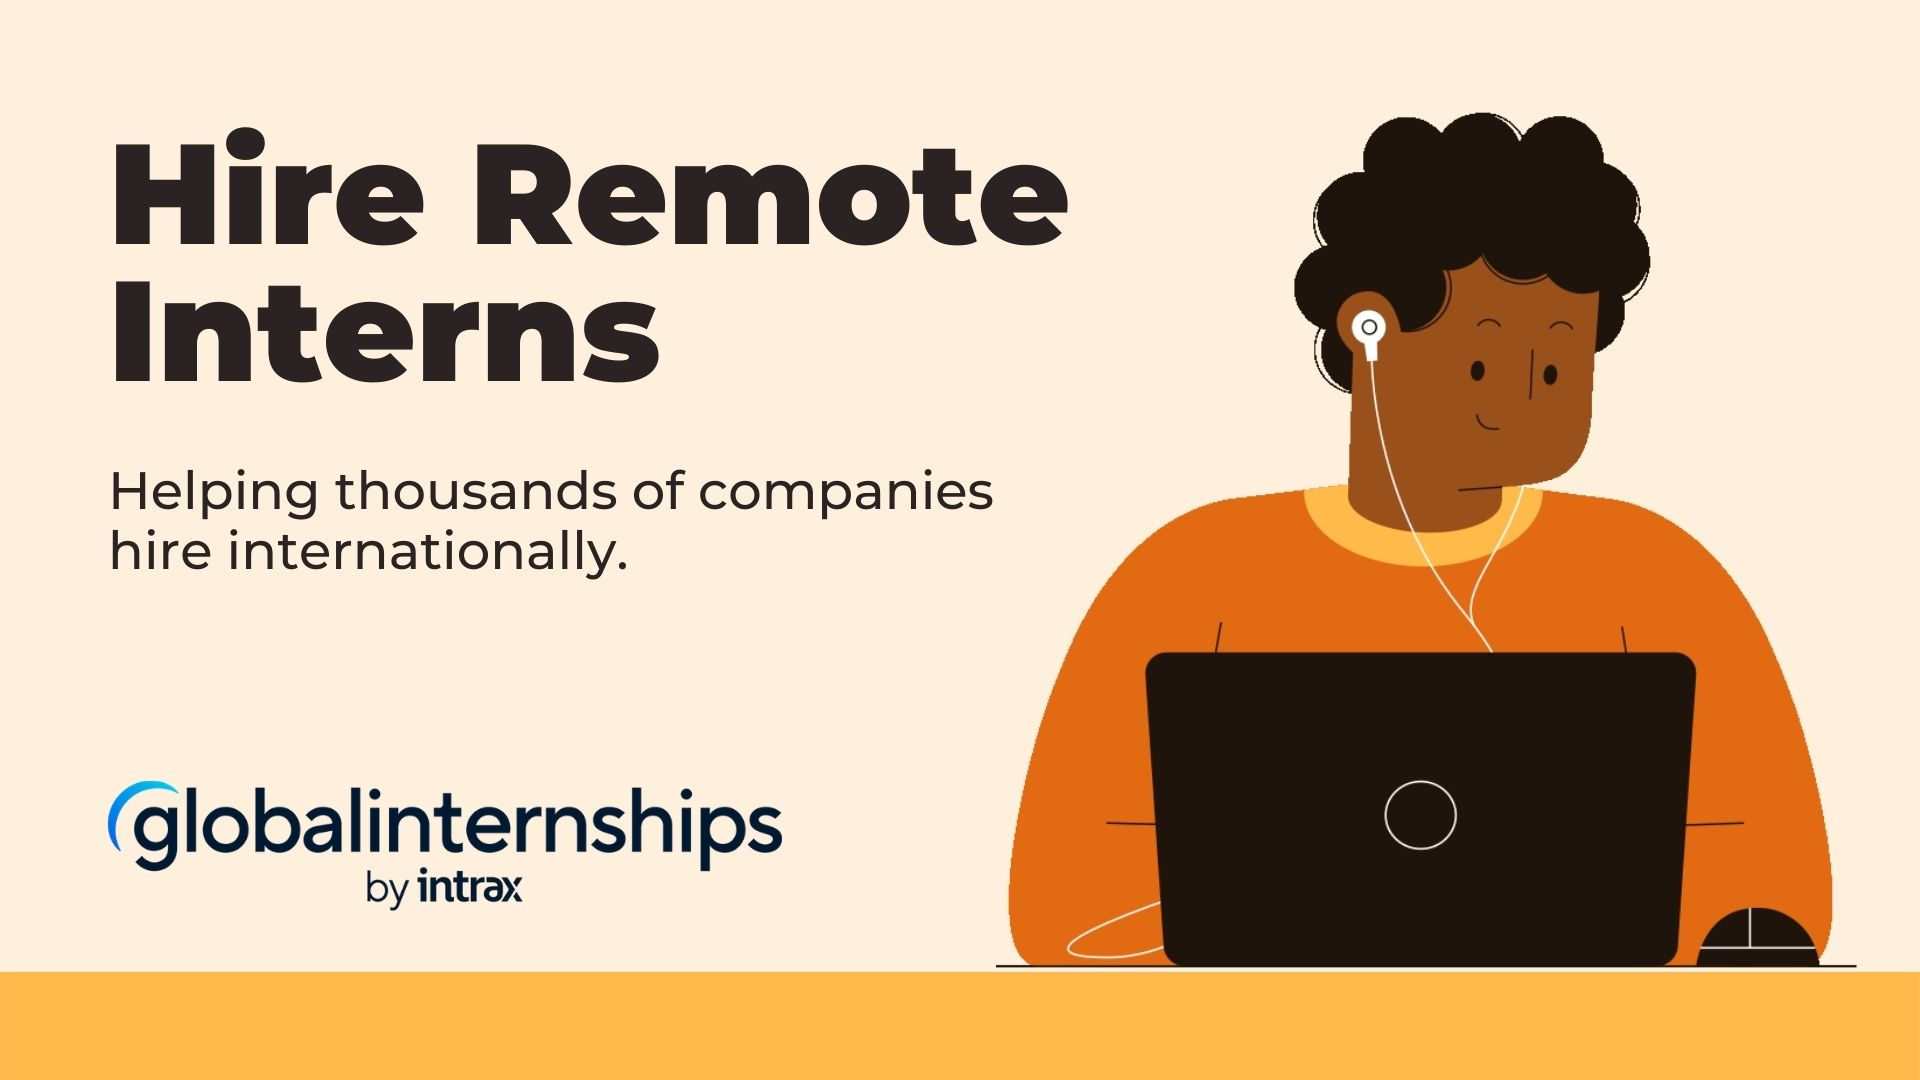 Hire Remote Interns